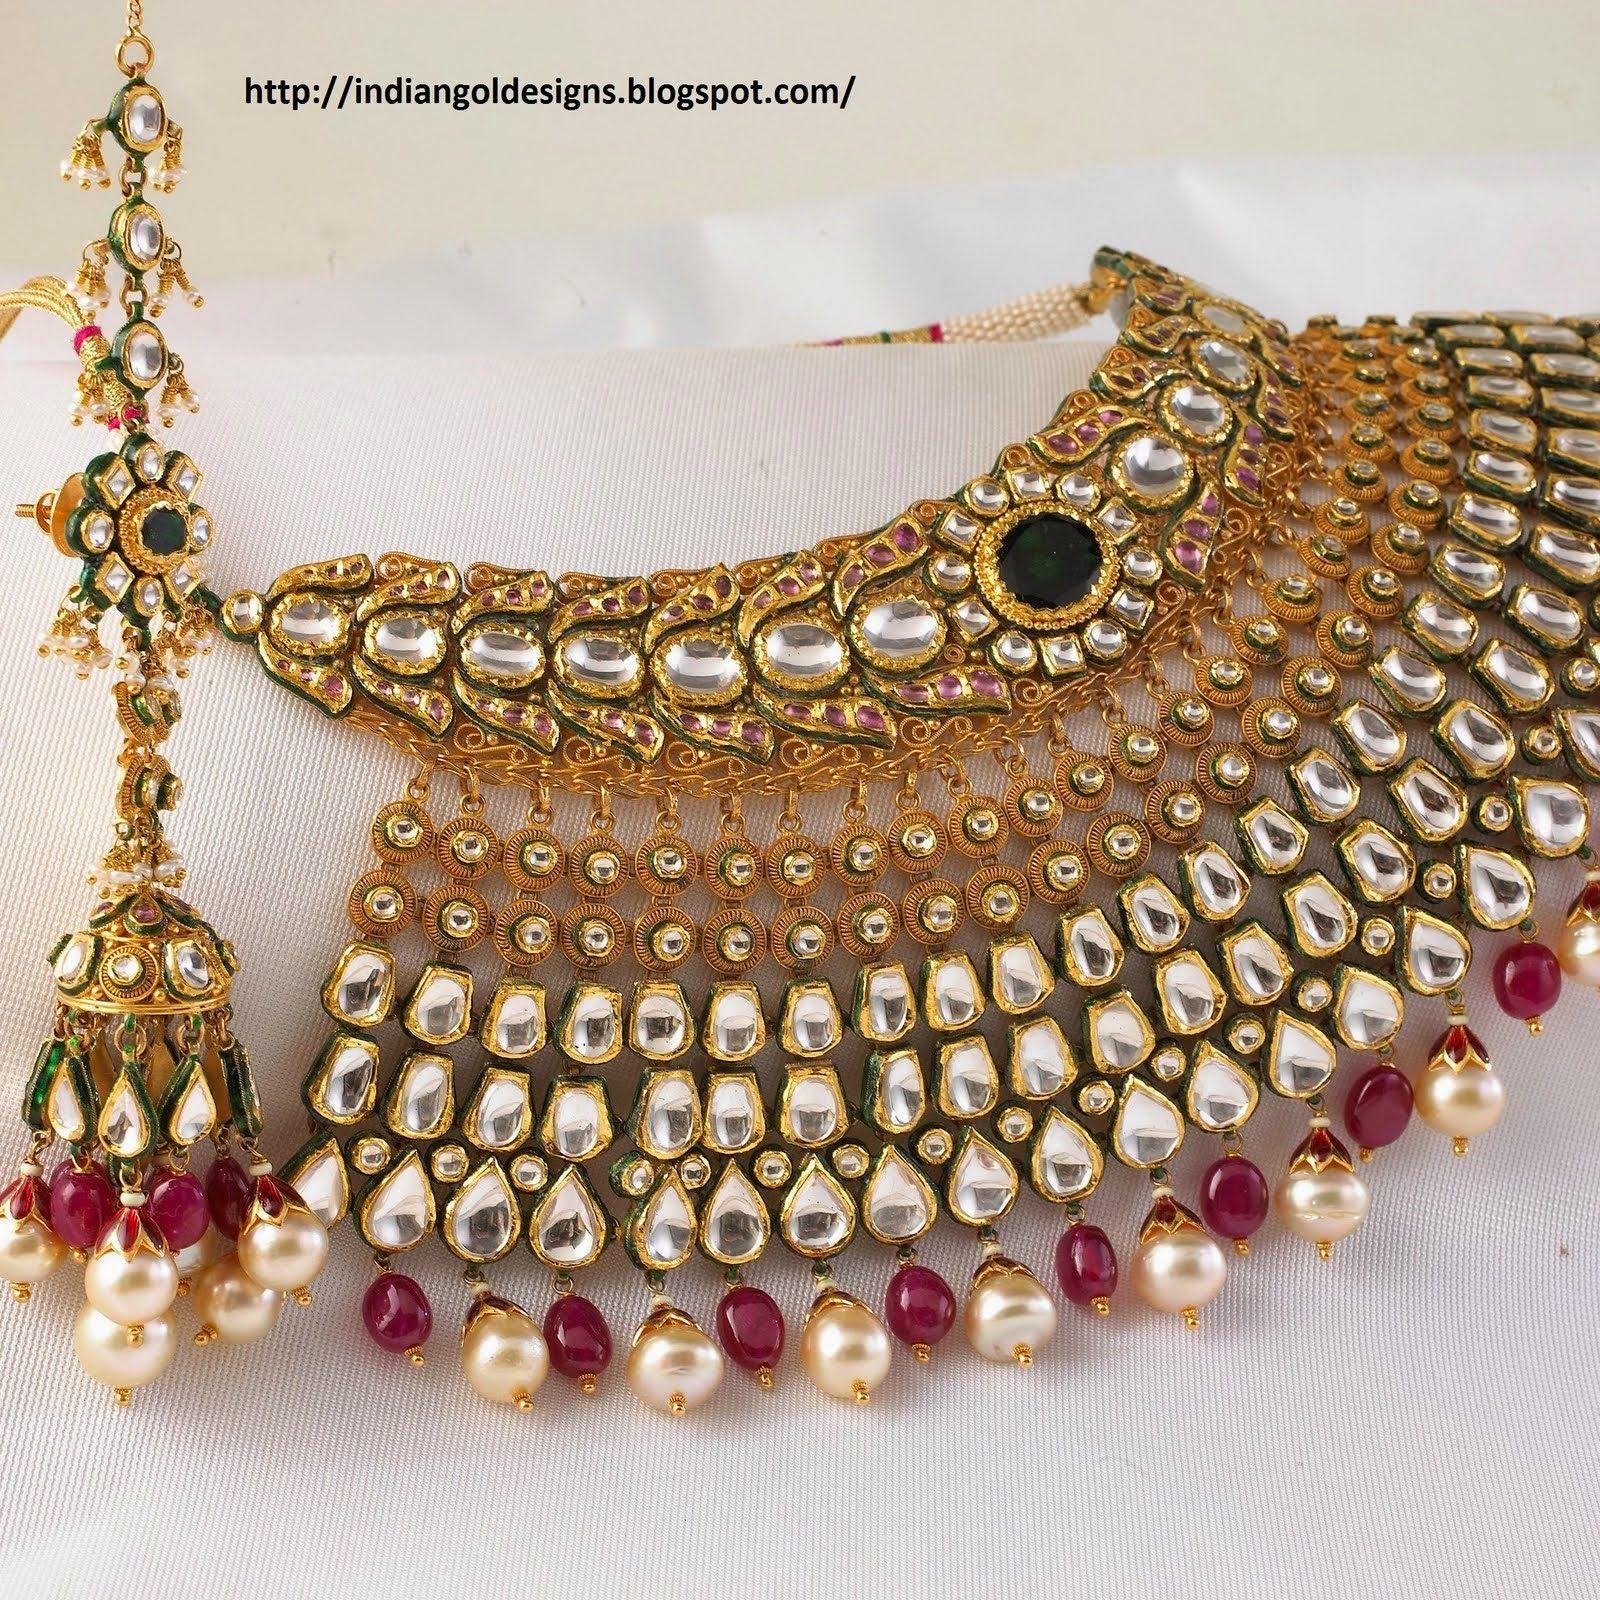 rajputi jewellery rakhdi - Google Search | gallery | Pinterest ...